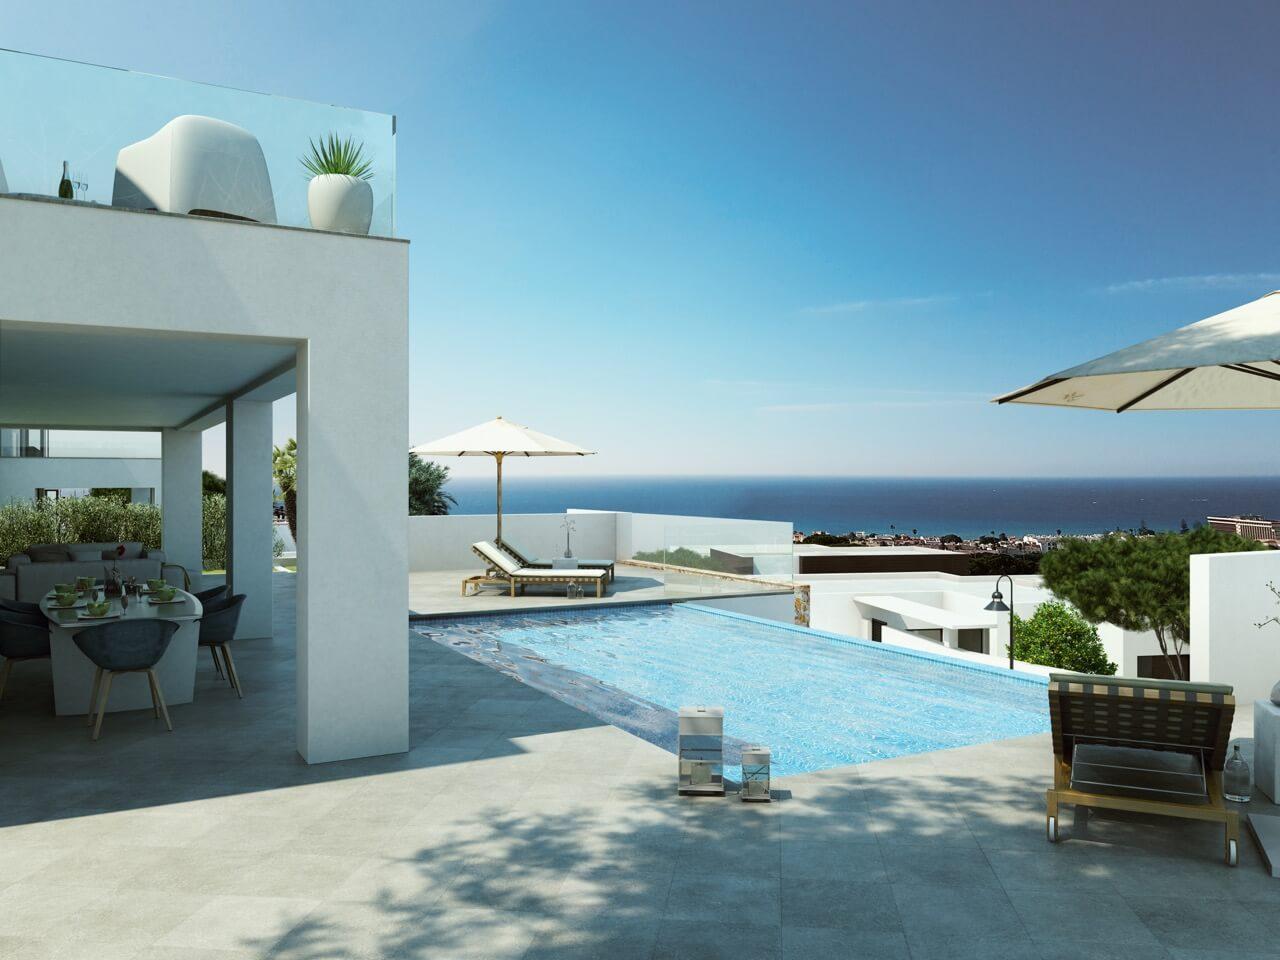 la cala views mijas costa villa modern nieuwbouw kopen zeezicht